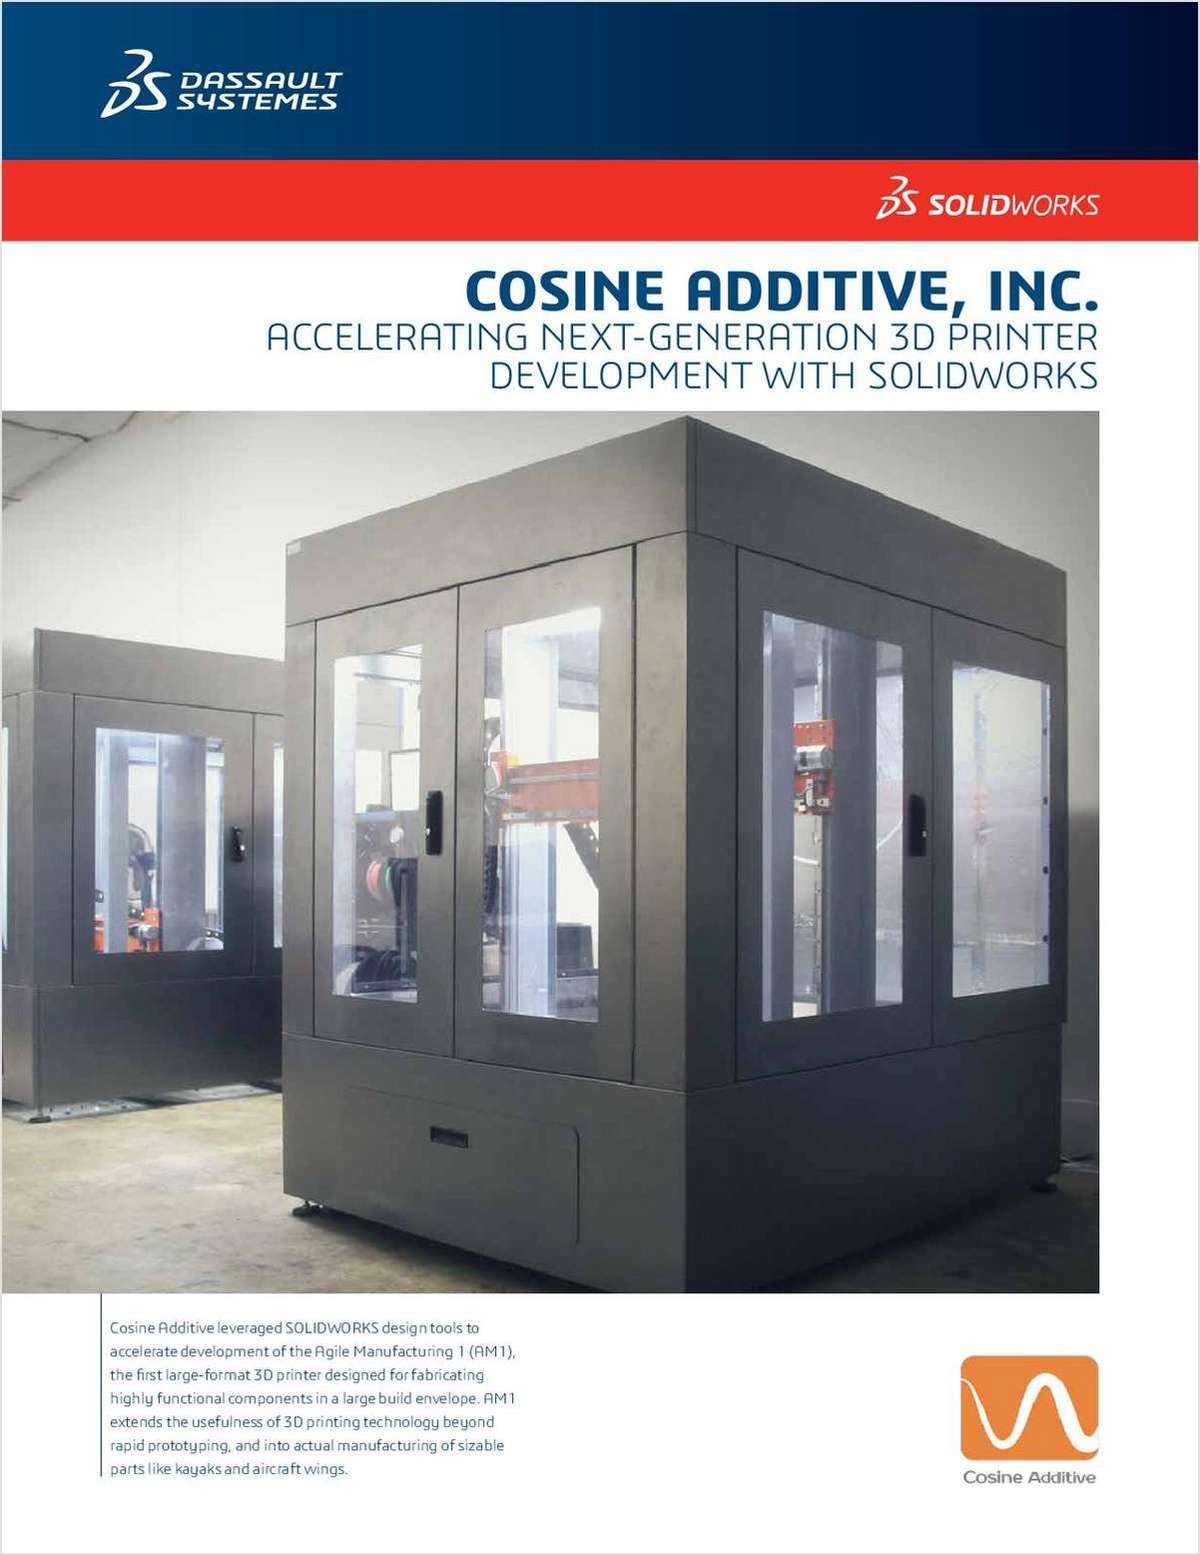 3D Design Advances 3D Printing